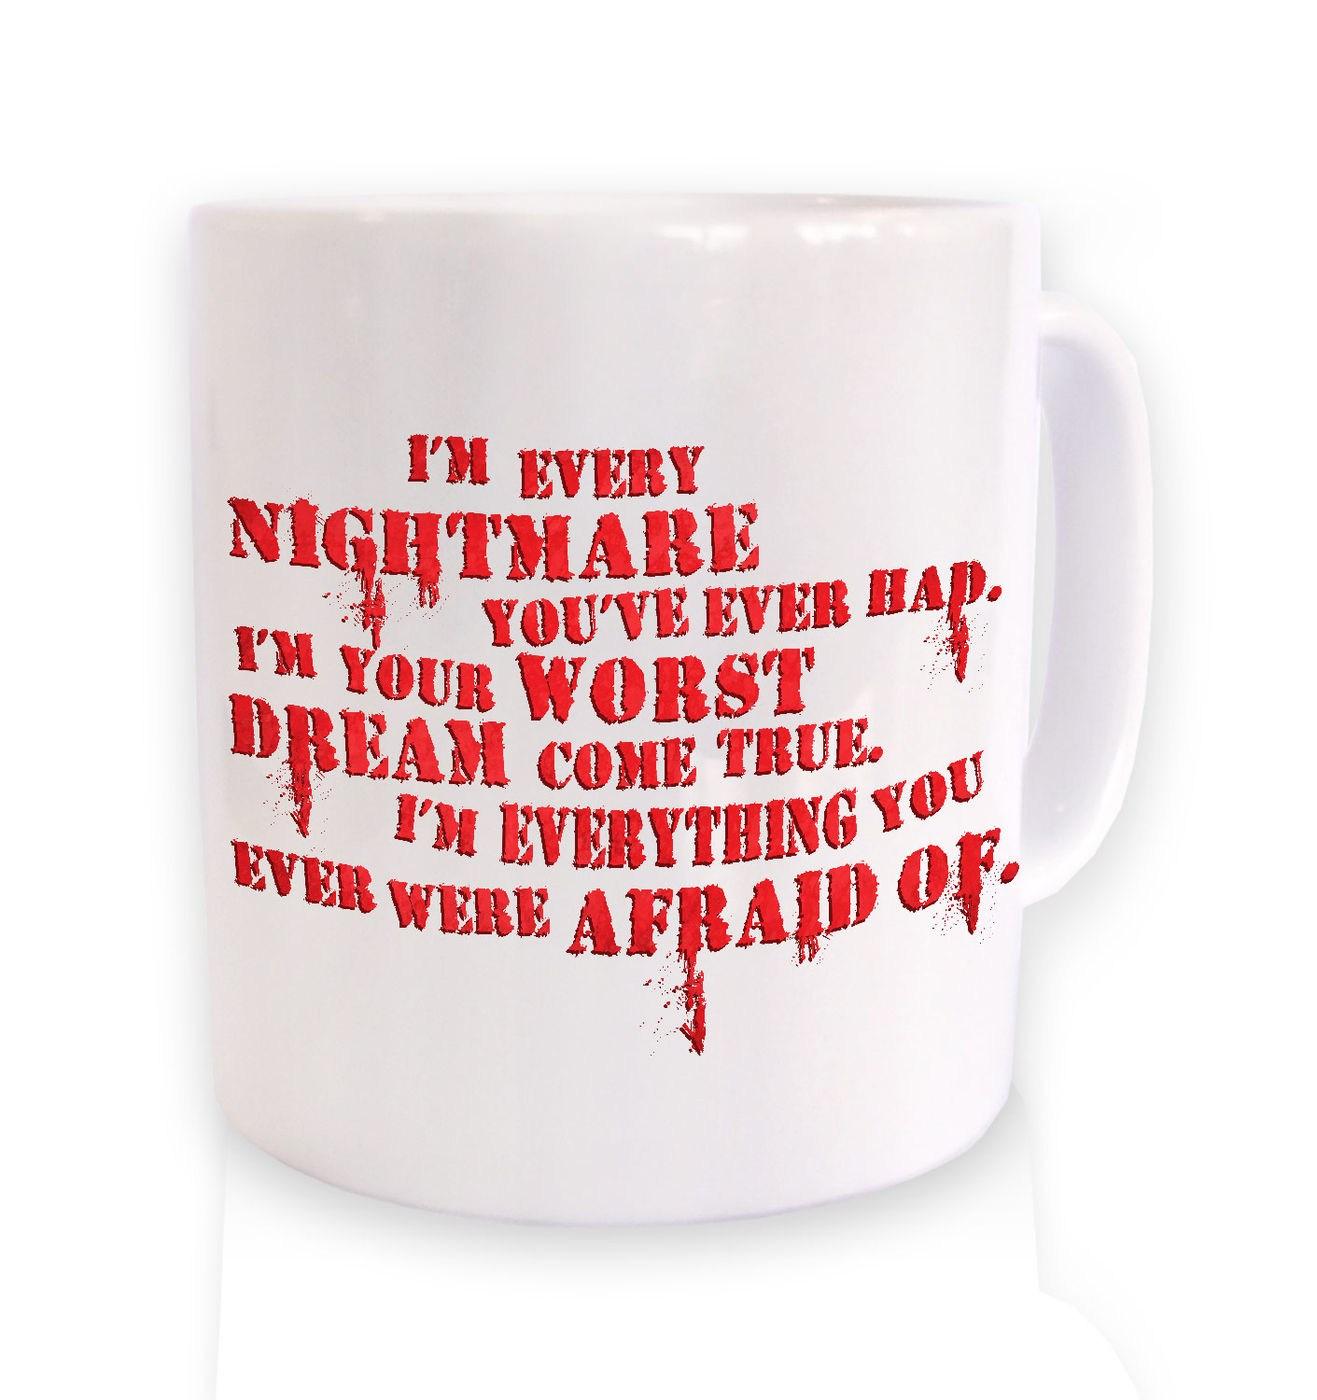 I'm Every Nightmare mug by Something Geeky